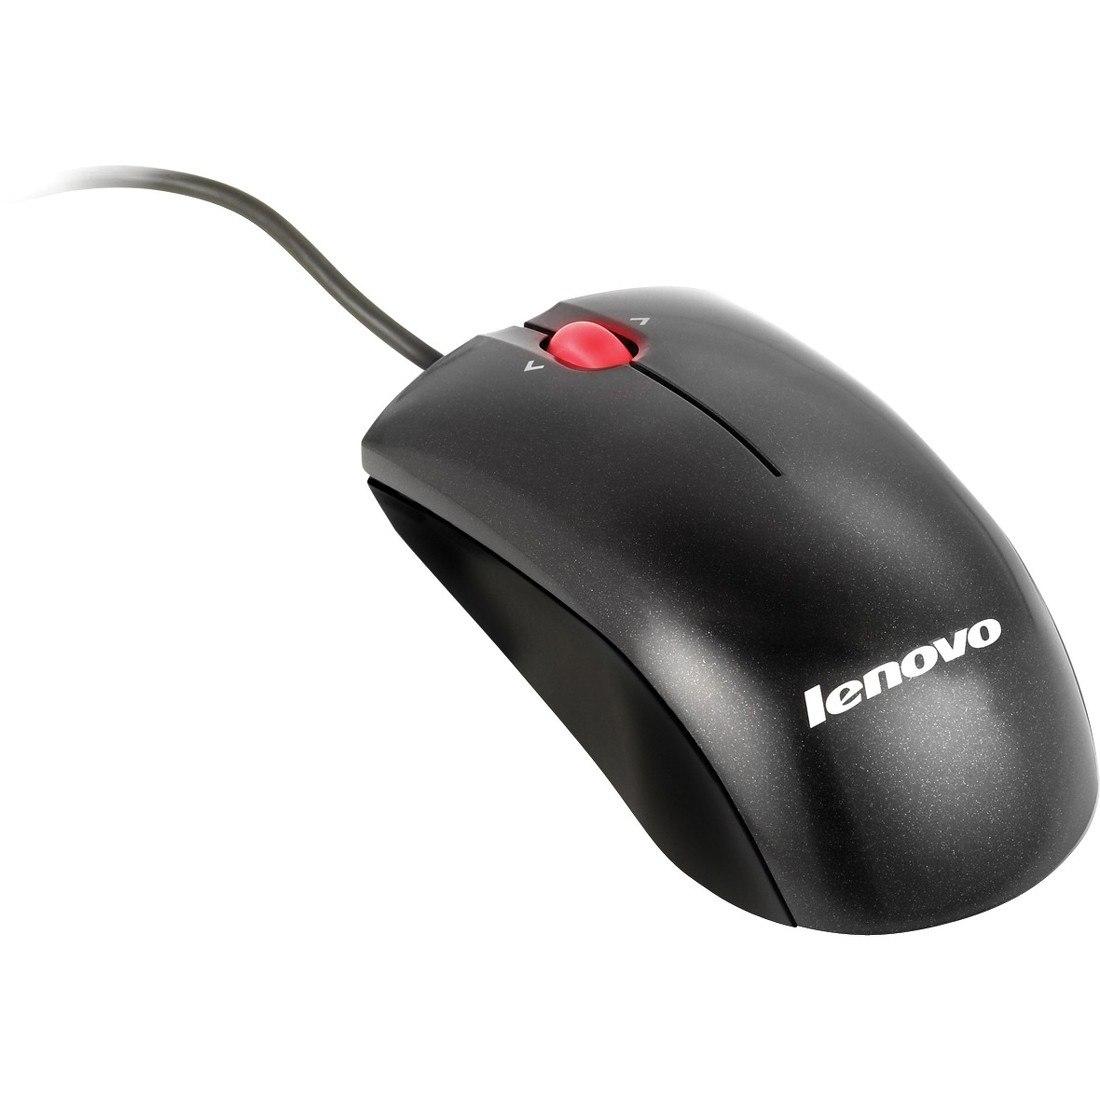 Lenovo 41U3074 Mouse - USB - Laser